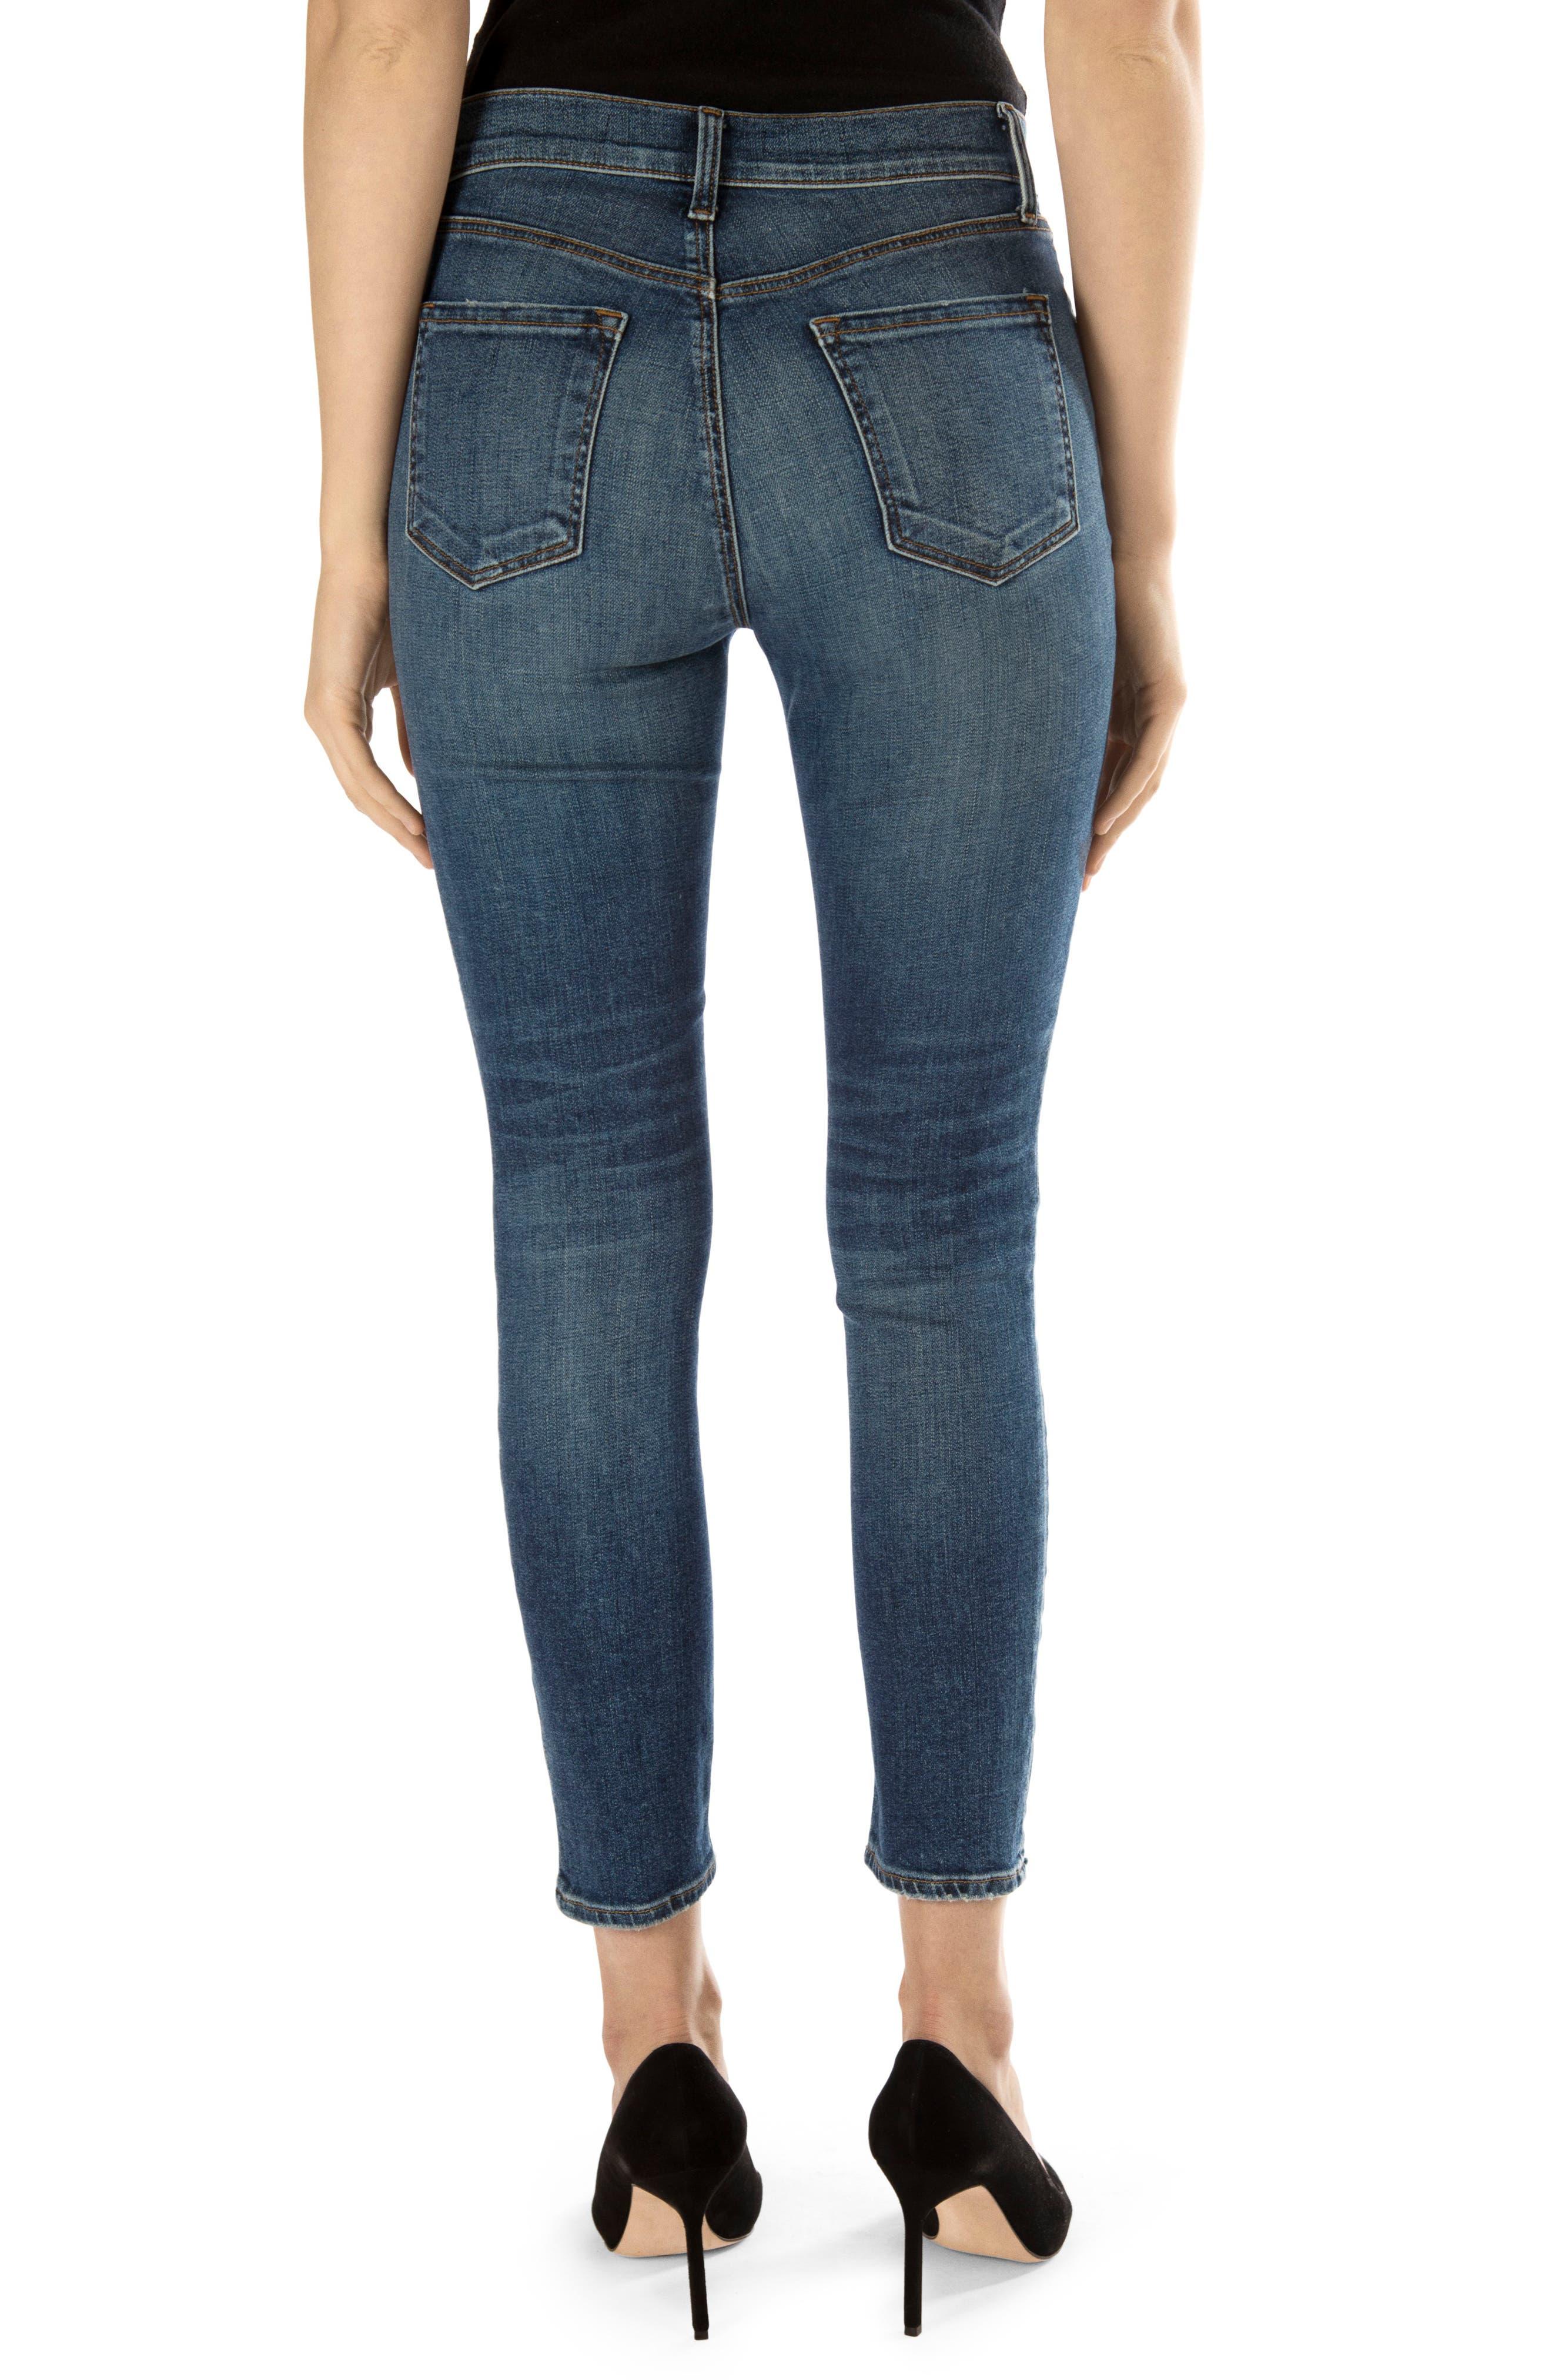 Alana High Waist Crop Skinny Jeans,                             Alternate thumbnail 2, color,                             469